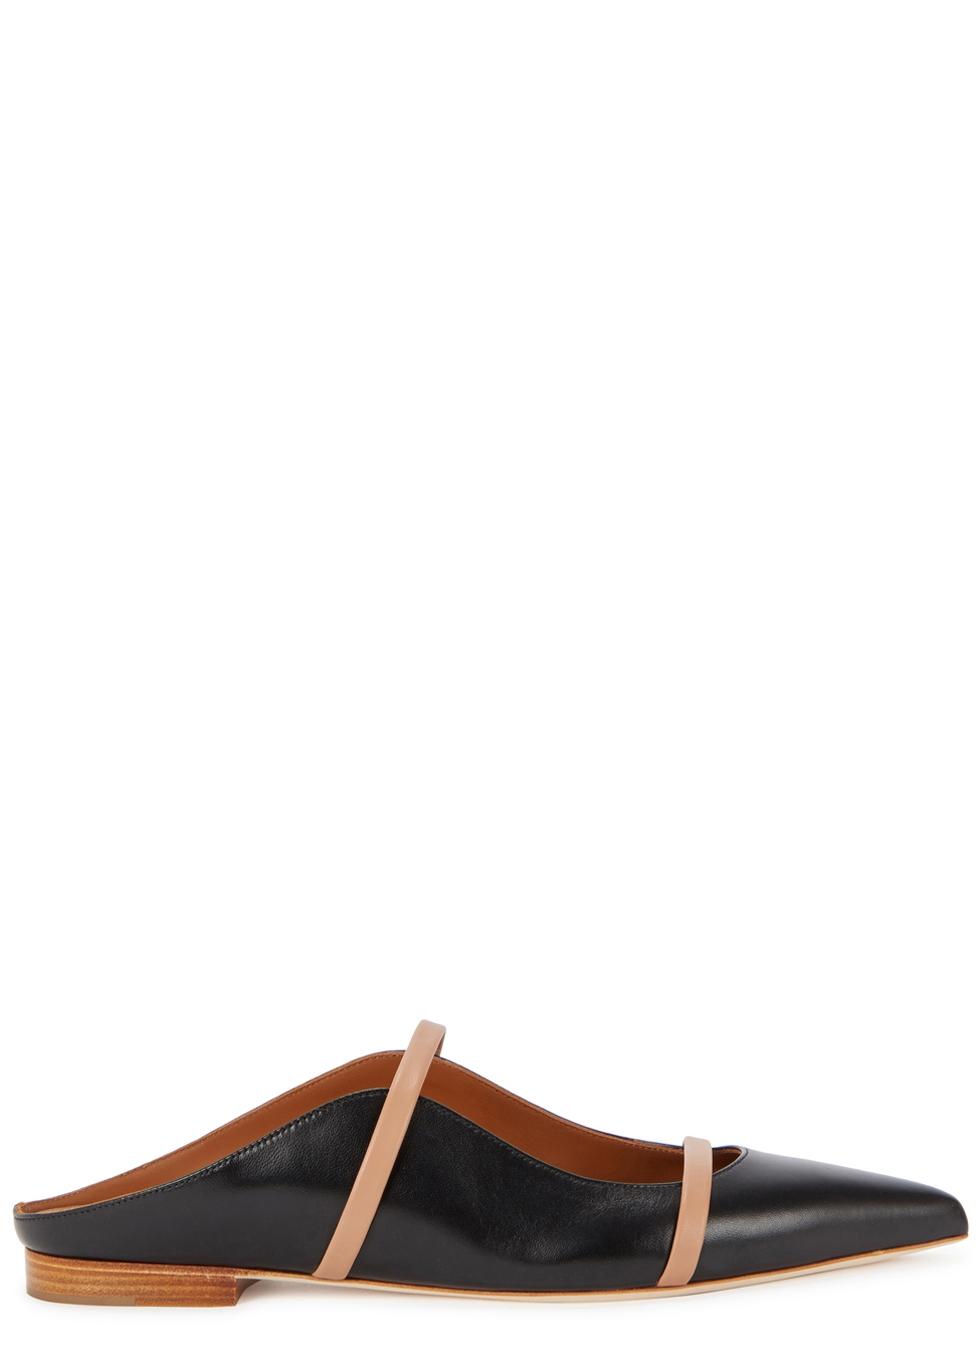 Maureen black leather mules